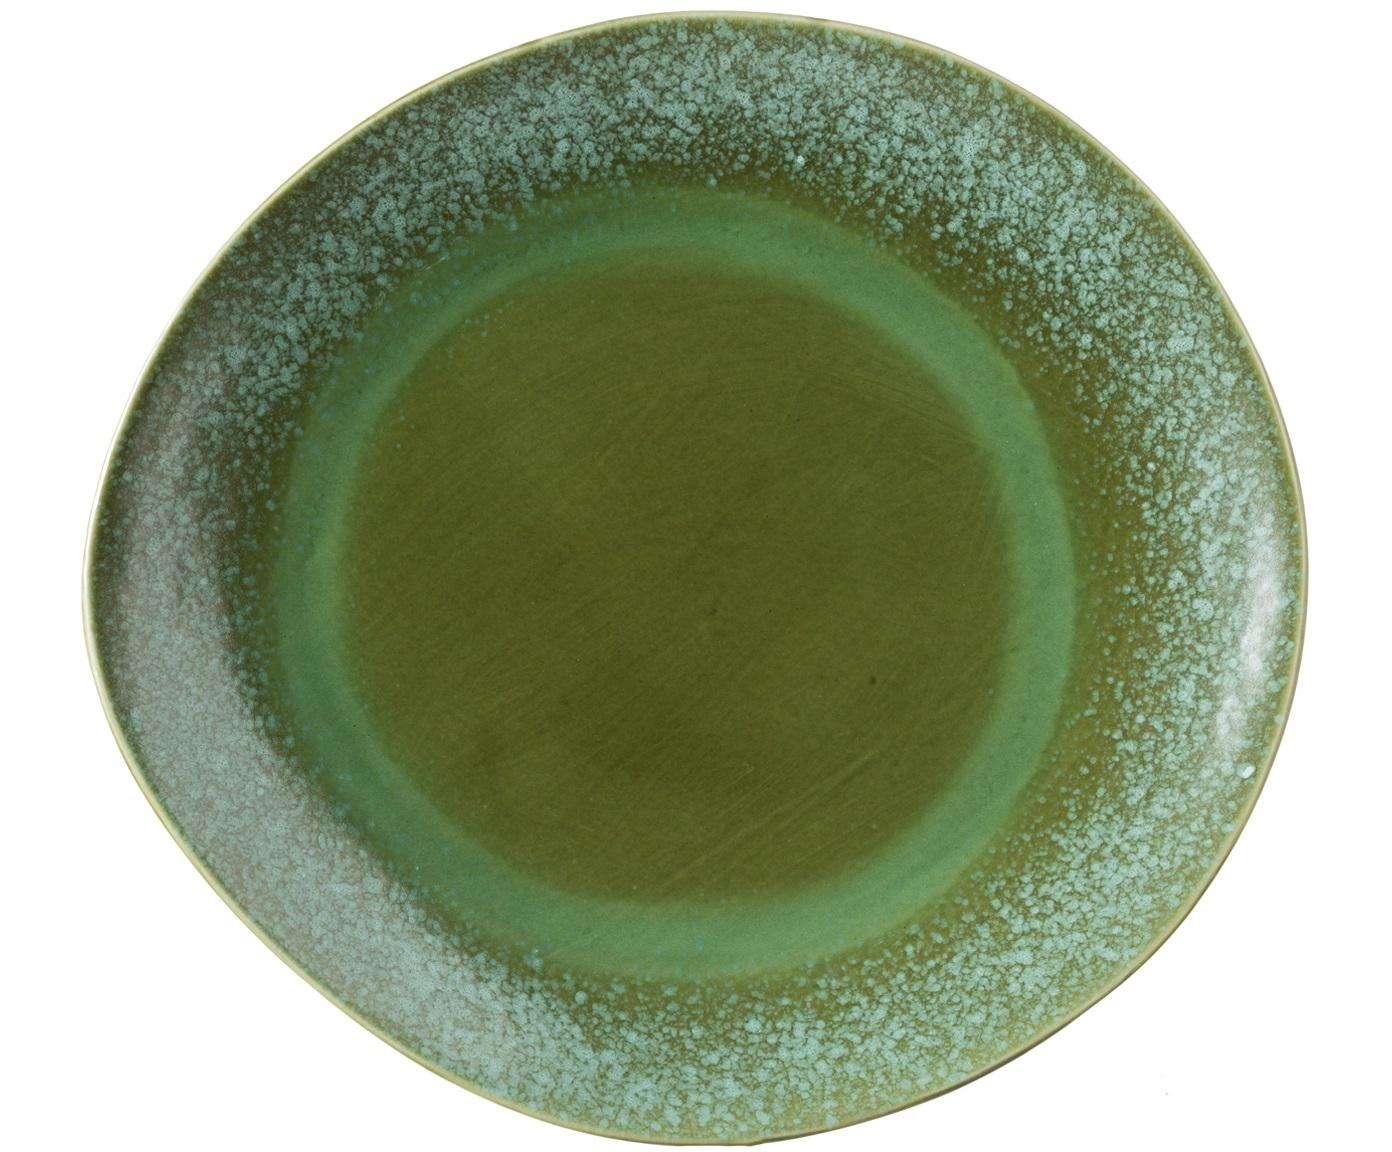 Handgemachte Platzteller 70's, 2 Stück, Keramik, Grüntöne, Ø 29 cm